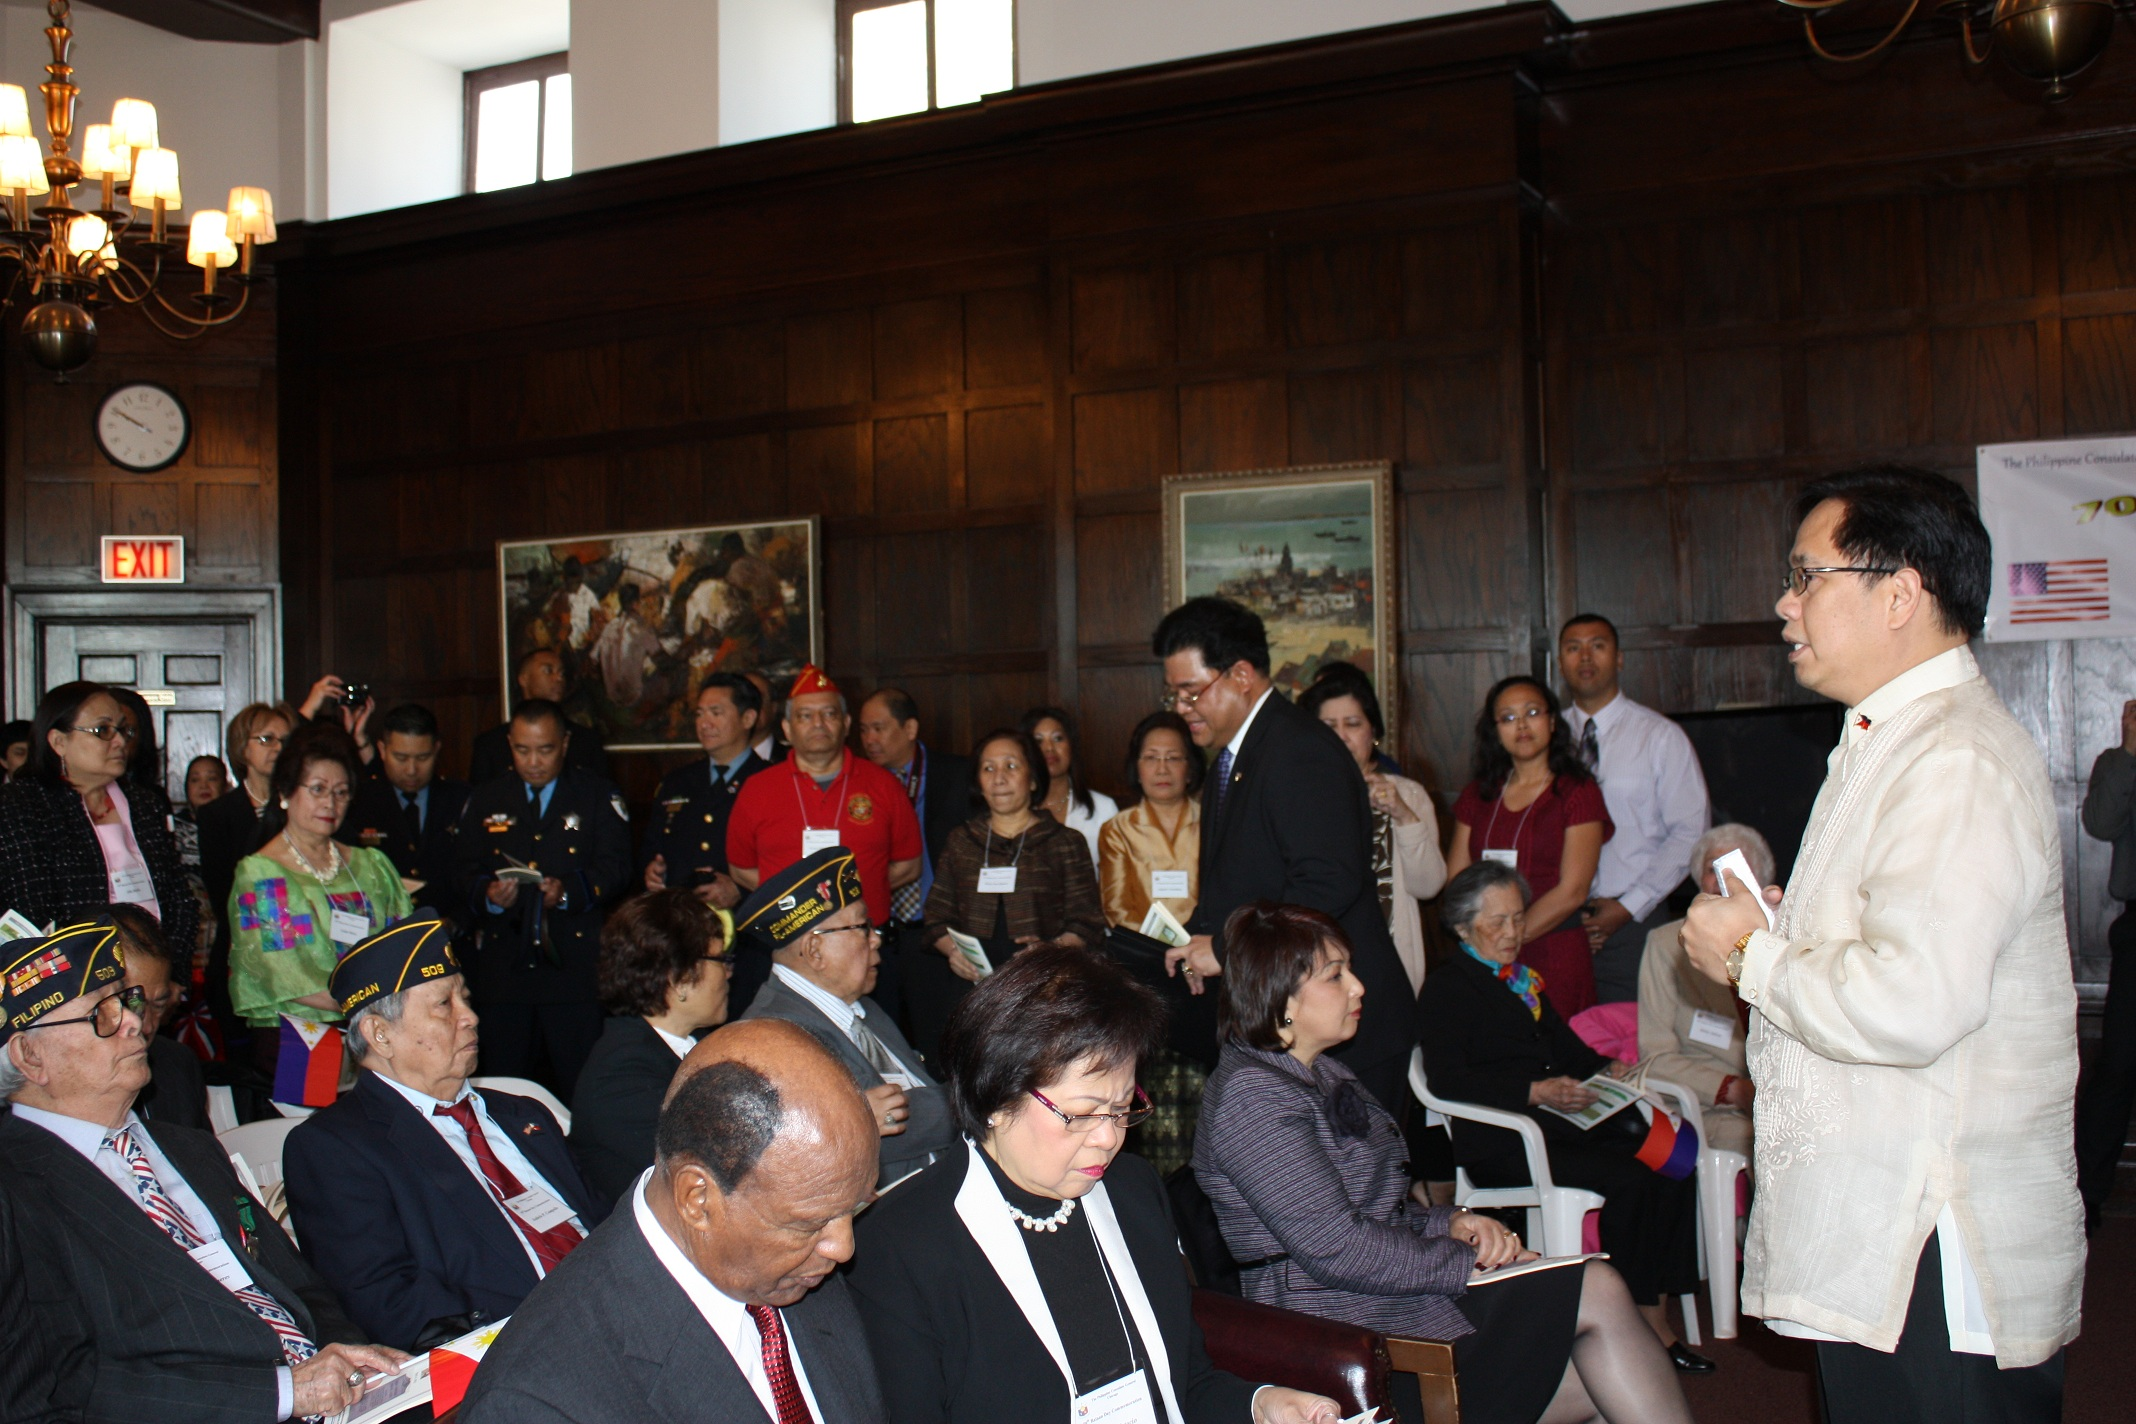 Bataan Day milestone celebration in Chicago | Veronica of